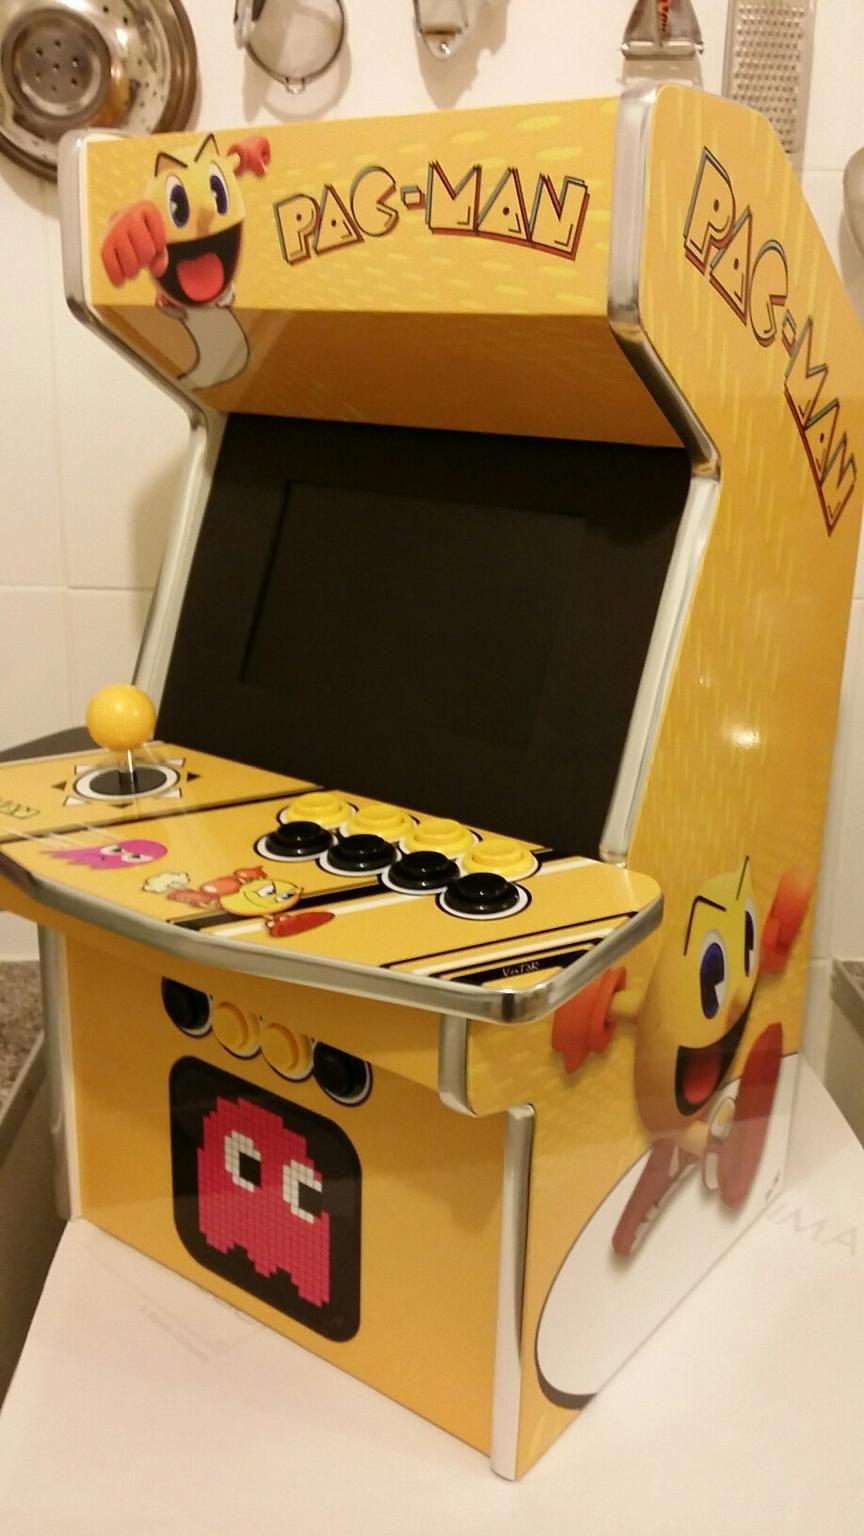 Custom Built Arcade Machine 😃Discover more awesome gaming